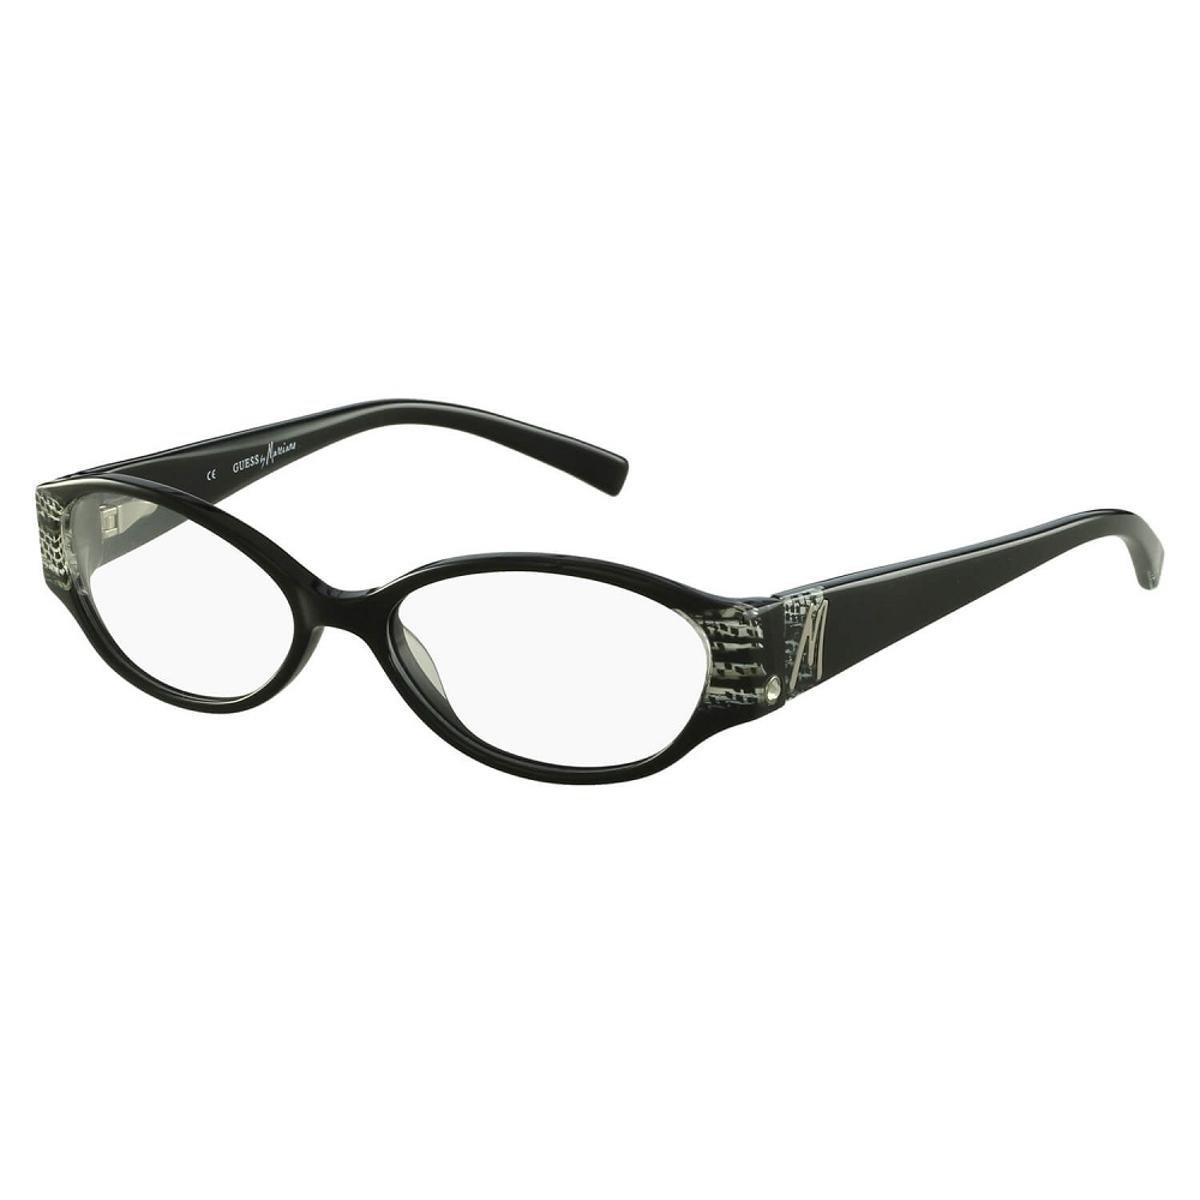 Óculos de Grau Marciano Guess Casual - Preto - Compre Agora   Zattini d284727756